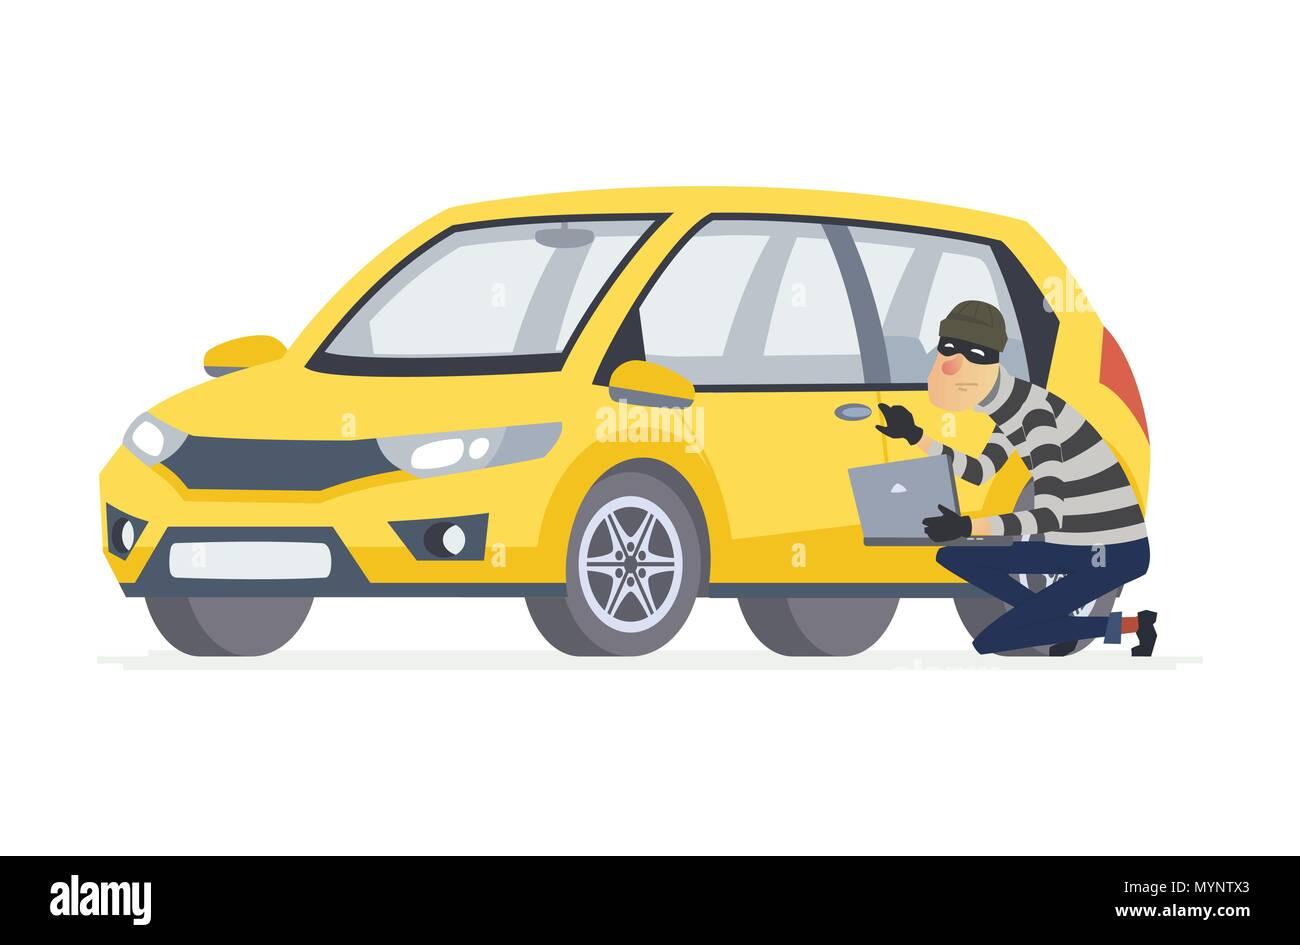 Car thief - cartoon people characters illustration - Stock Image